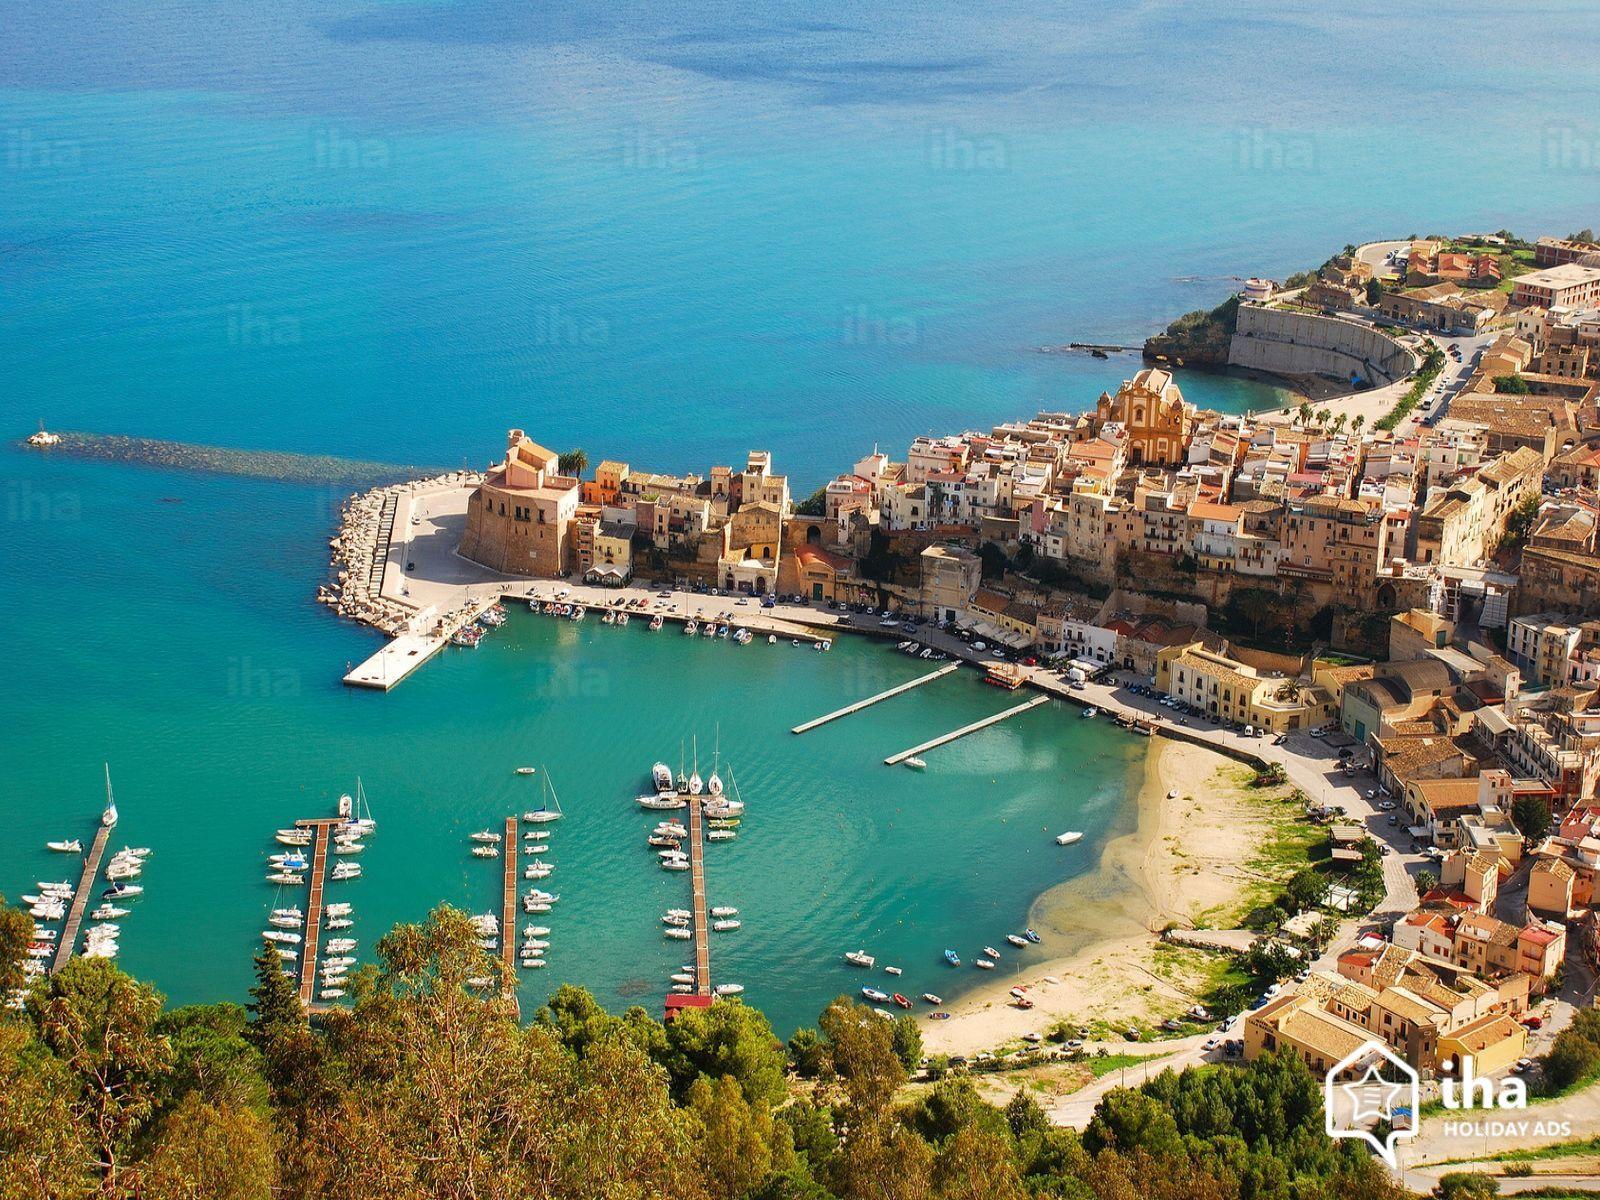 Noleggio Barche Castellamare del Golfo - Navalia | Noleggia un Sogno